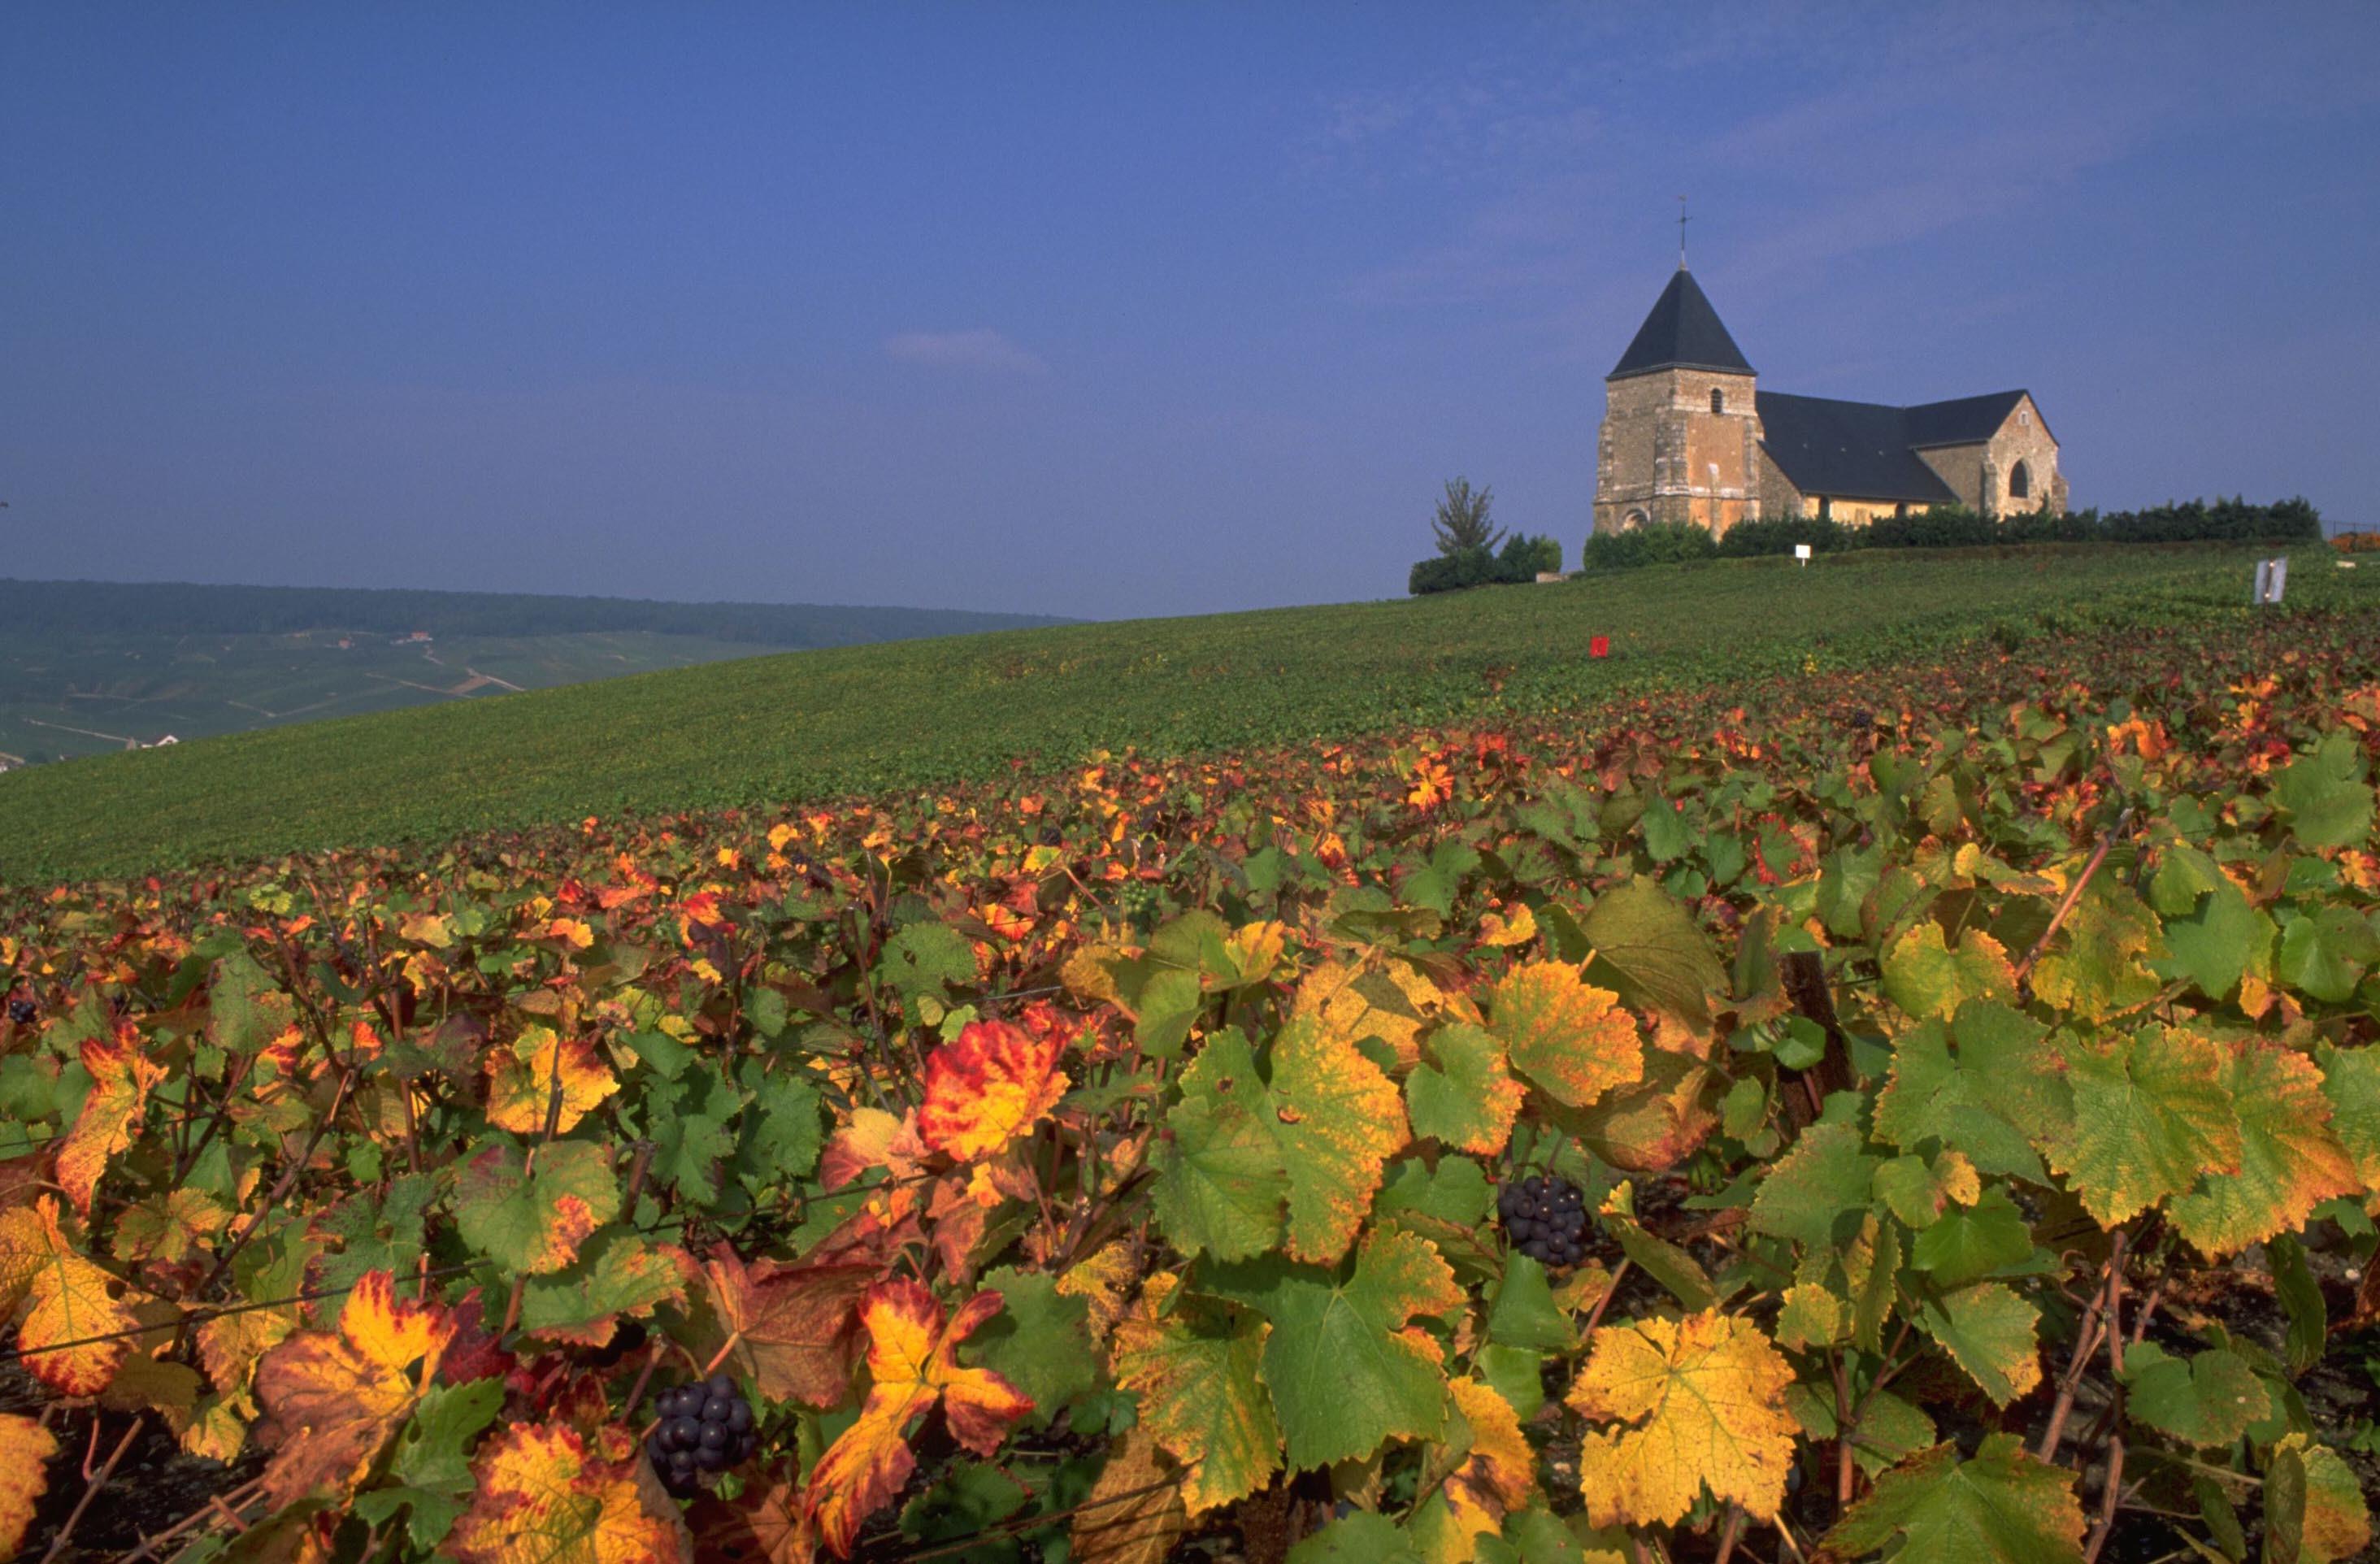 Vineyard in the champagne region france wallpapers and for Champagne region in france